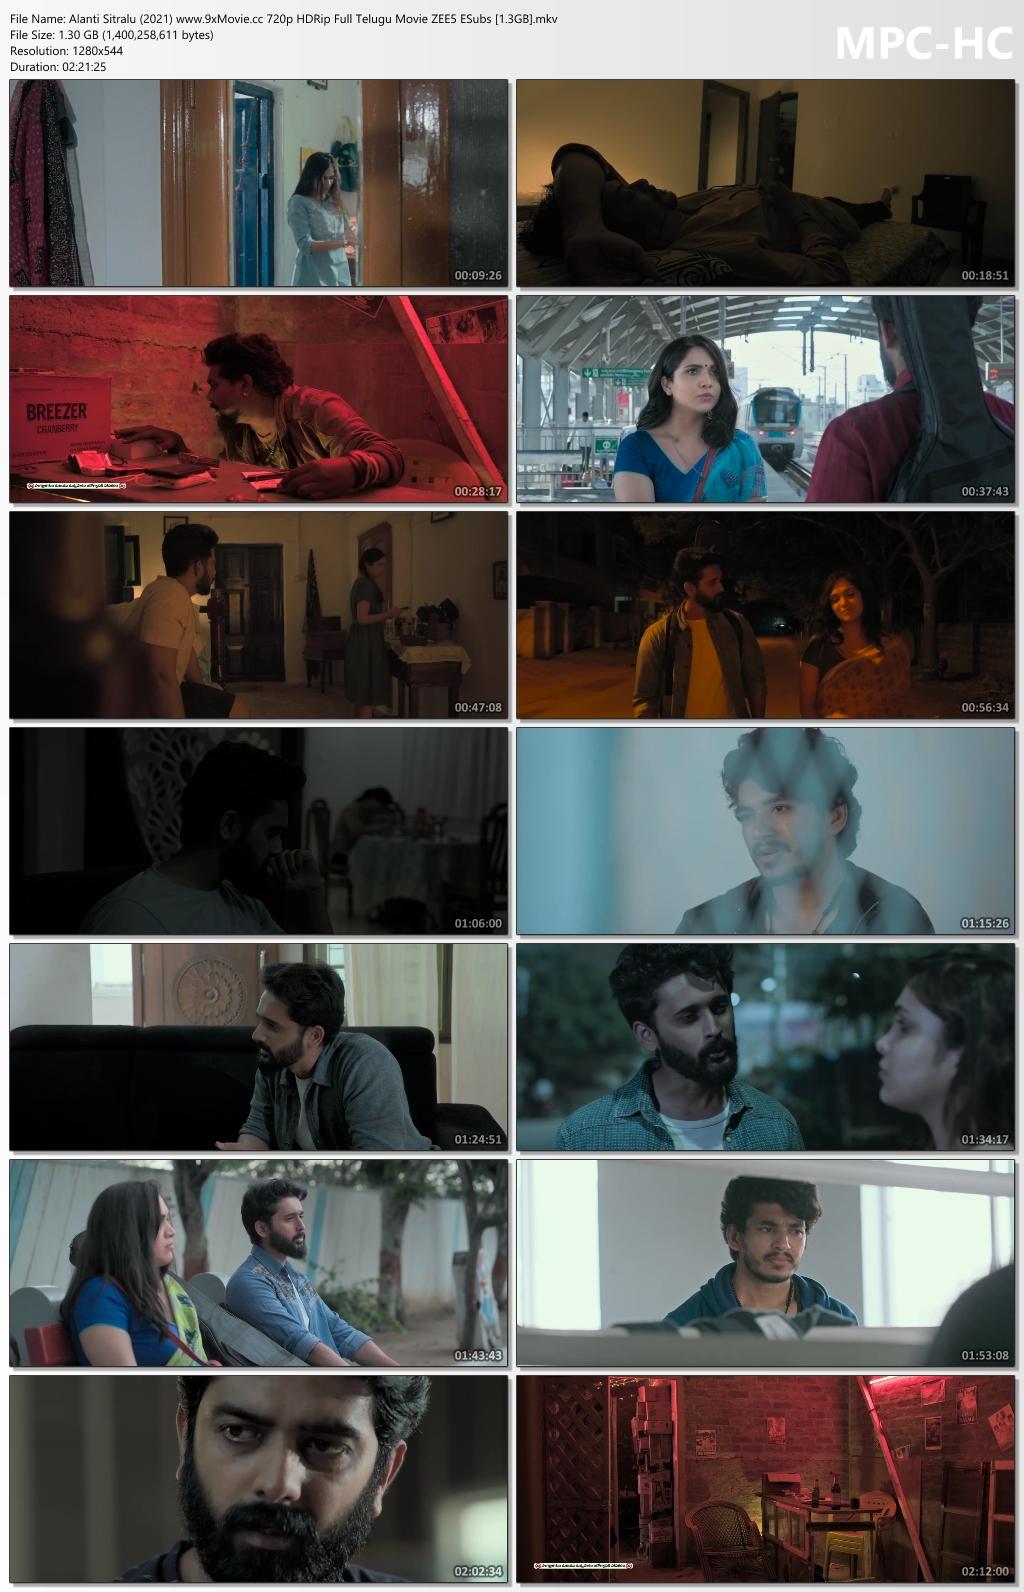 Alanti-Sitralu-2021-www-9x-Movie-cc-720p-HDRip-Full-Telugu-Movie-ZEE5-ESubs-1-3-GB-mkv